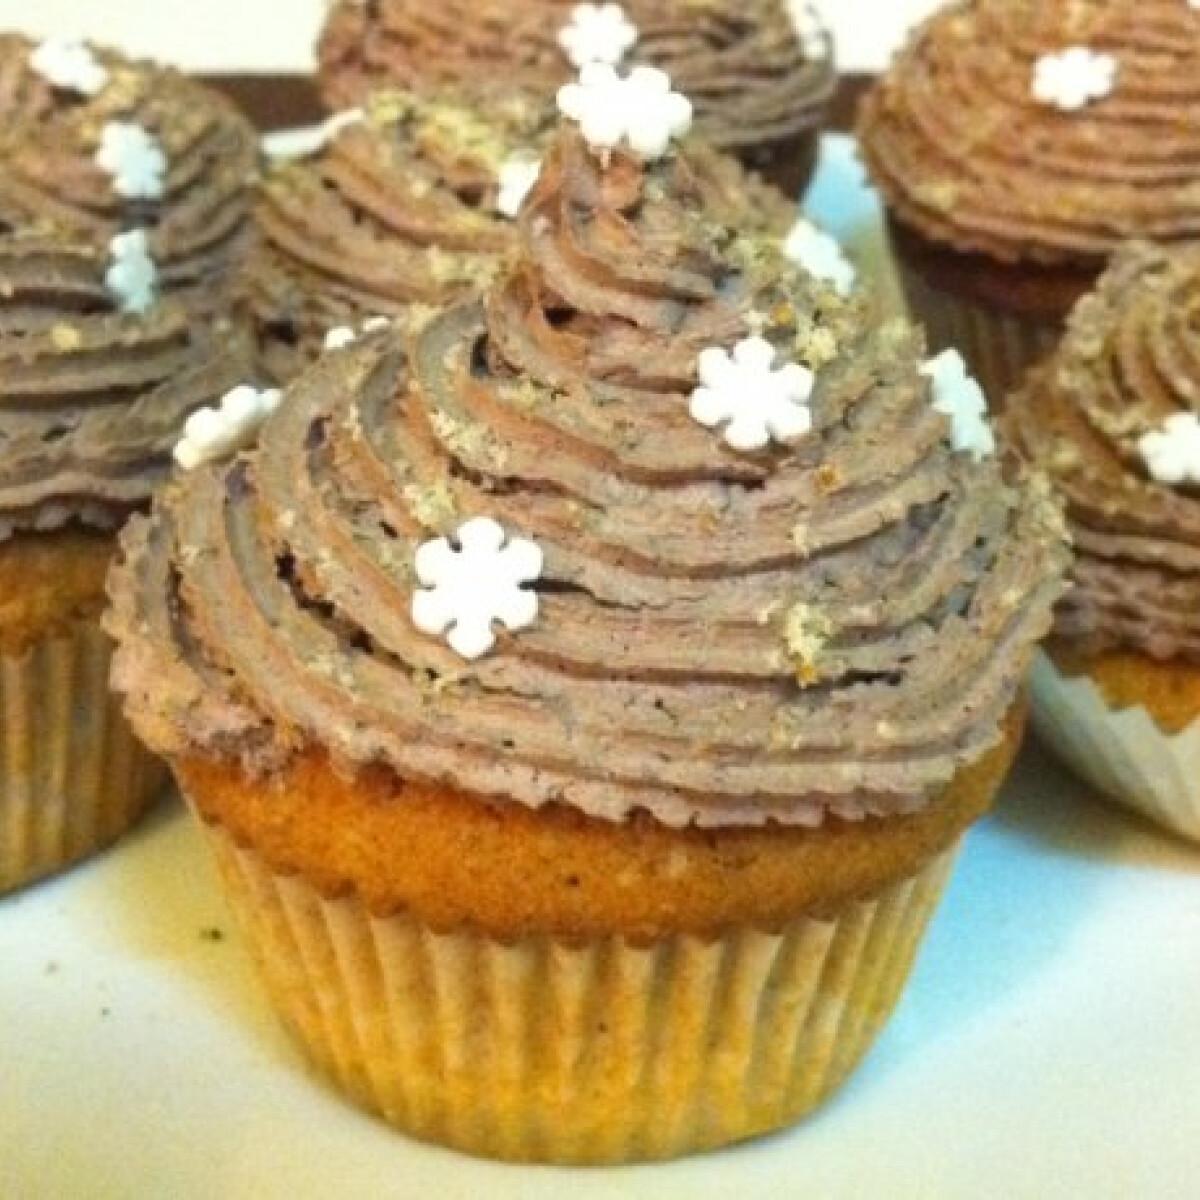 Ezen a képen: Diós-kakaókrémes cupcake